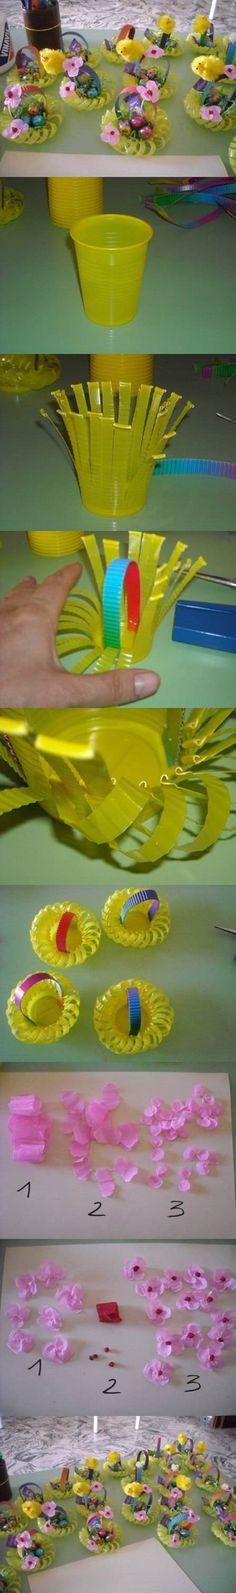 DIY Plastic Cup Easter Basket 2